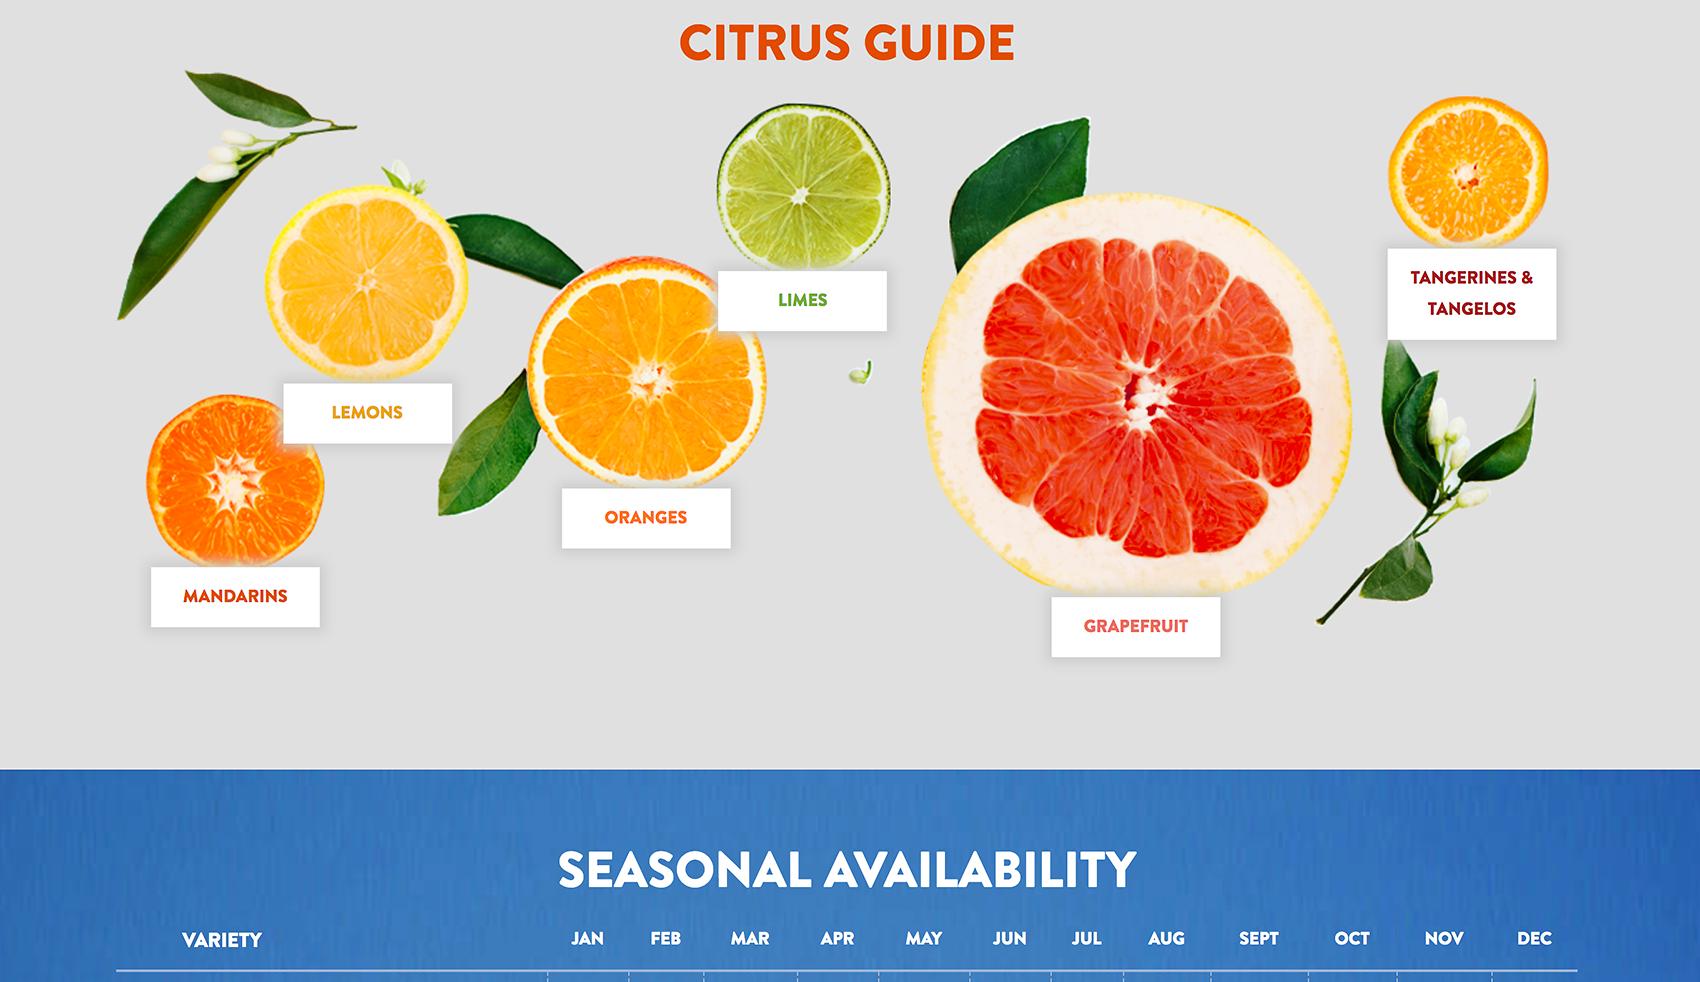 Sunkist employes many sensory images on their website.